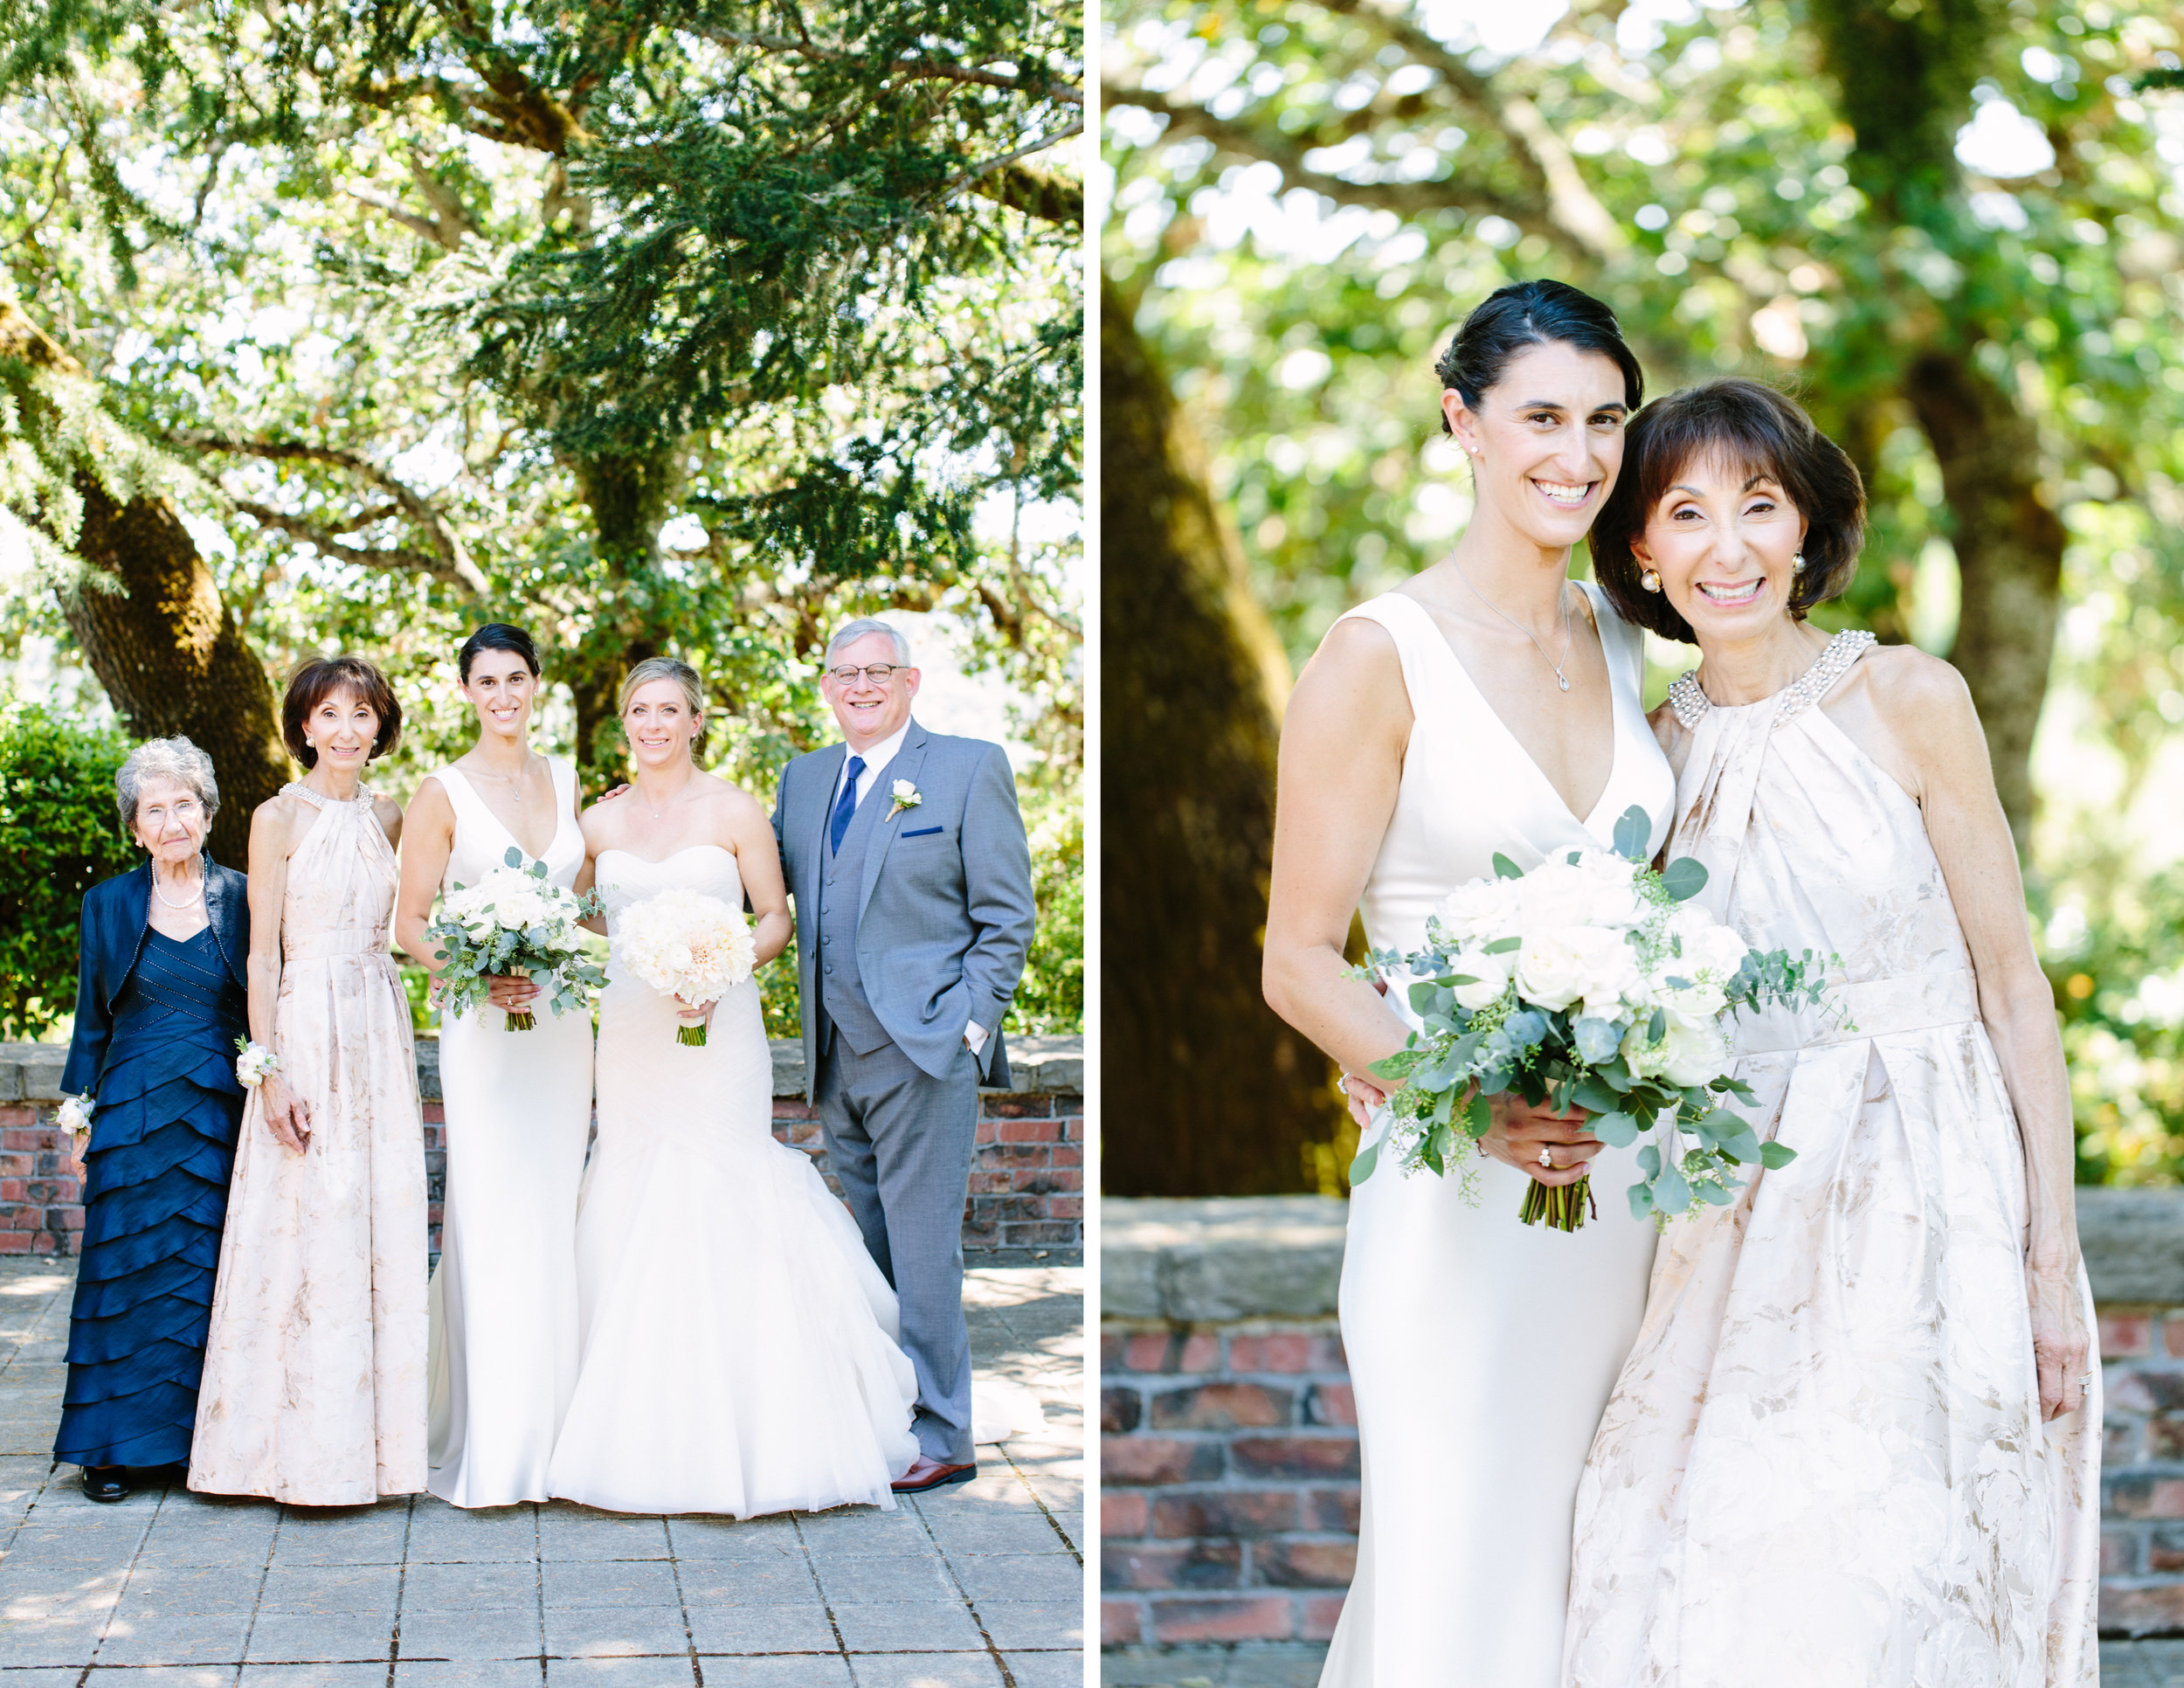 kunde estate winery wedding 6.jpg